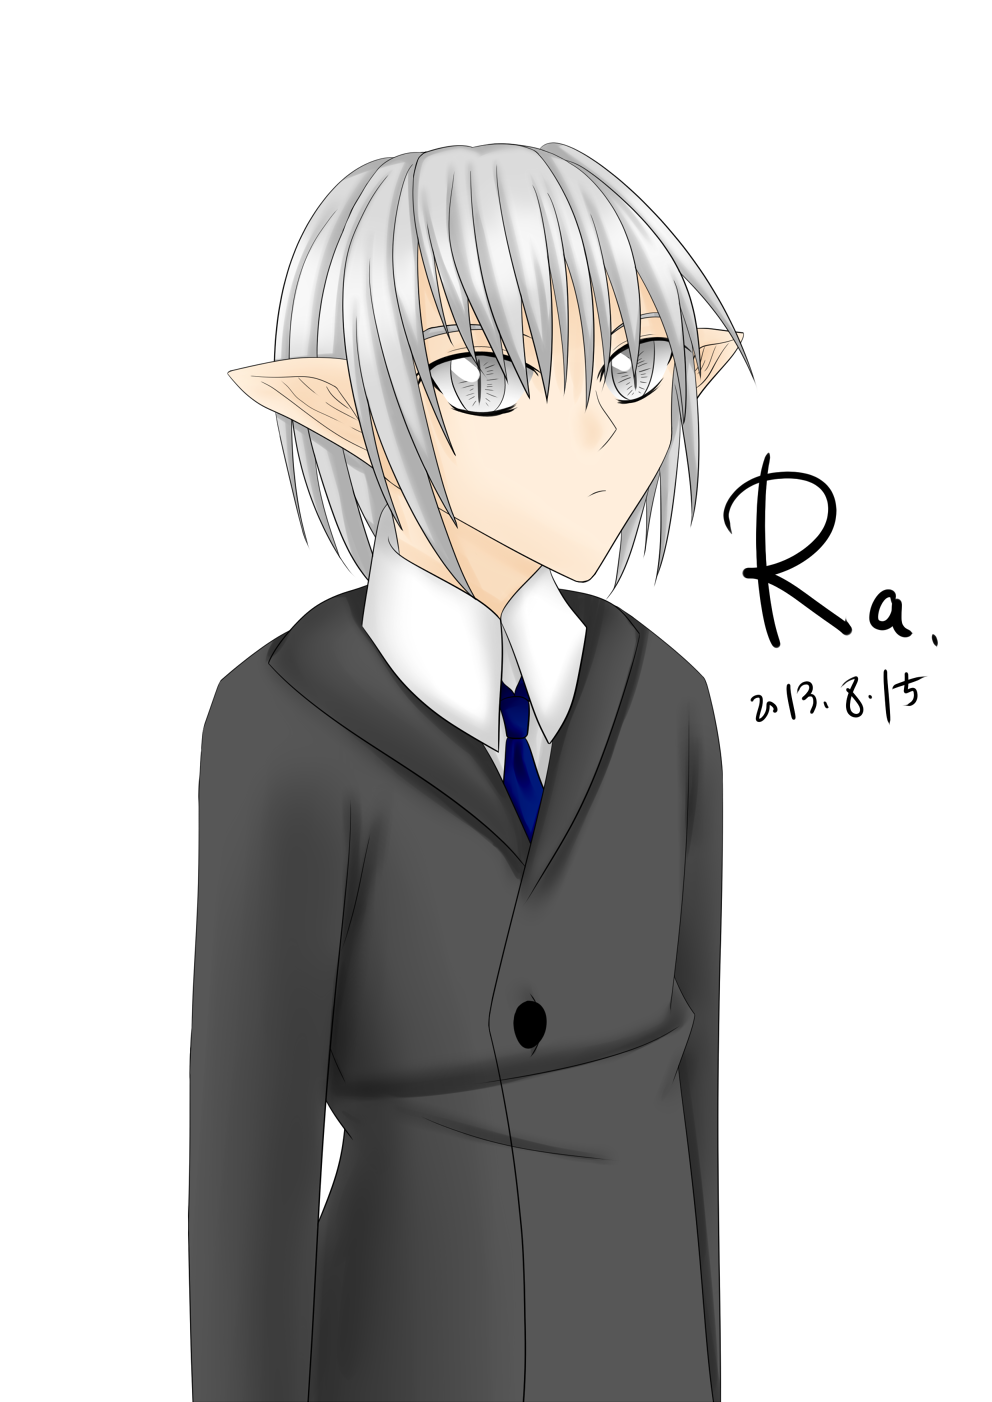 Ra by Renny1998